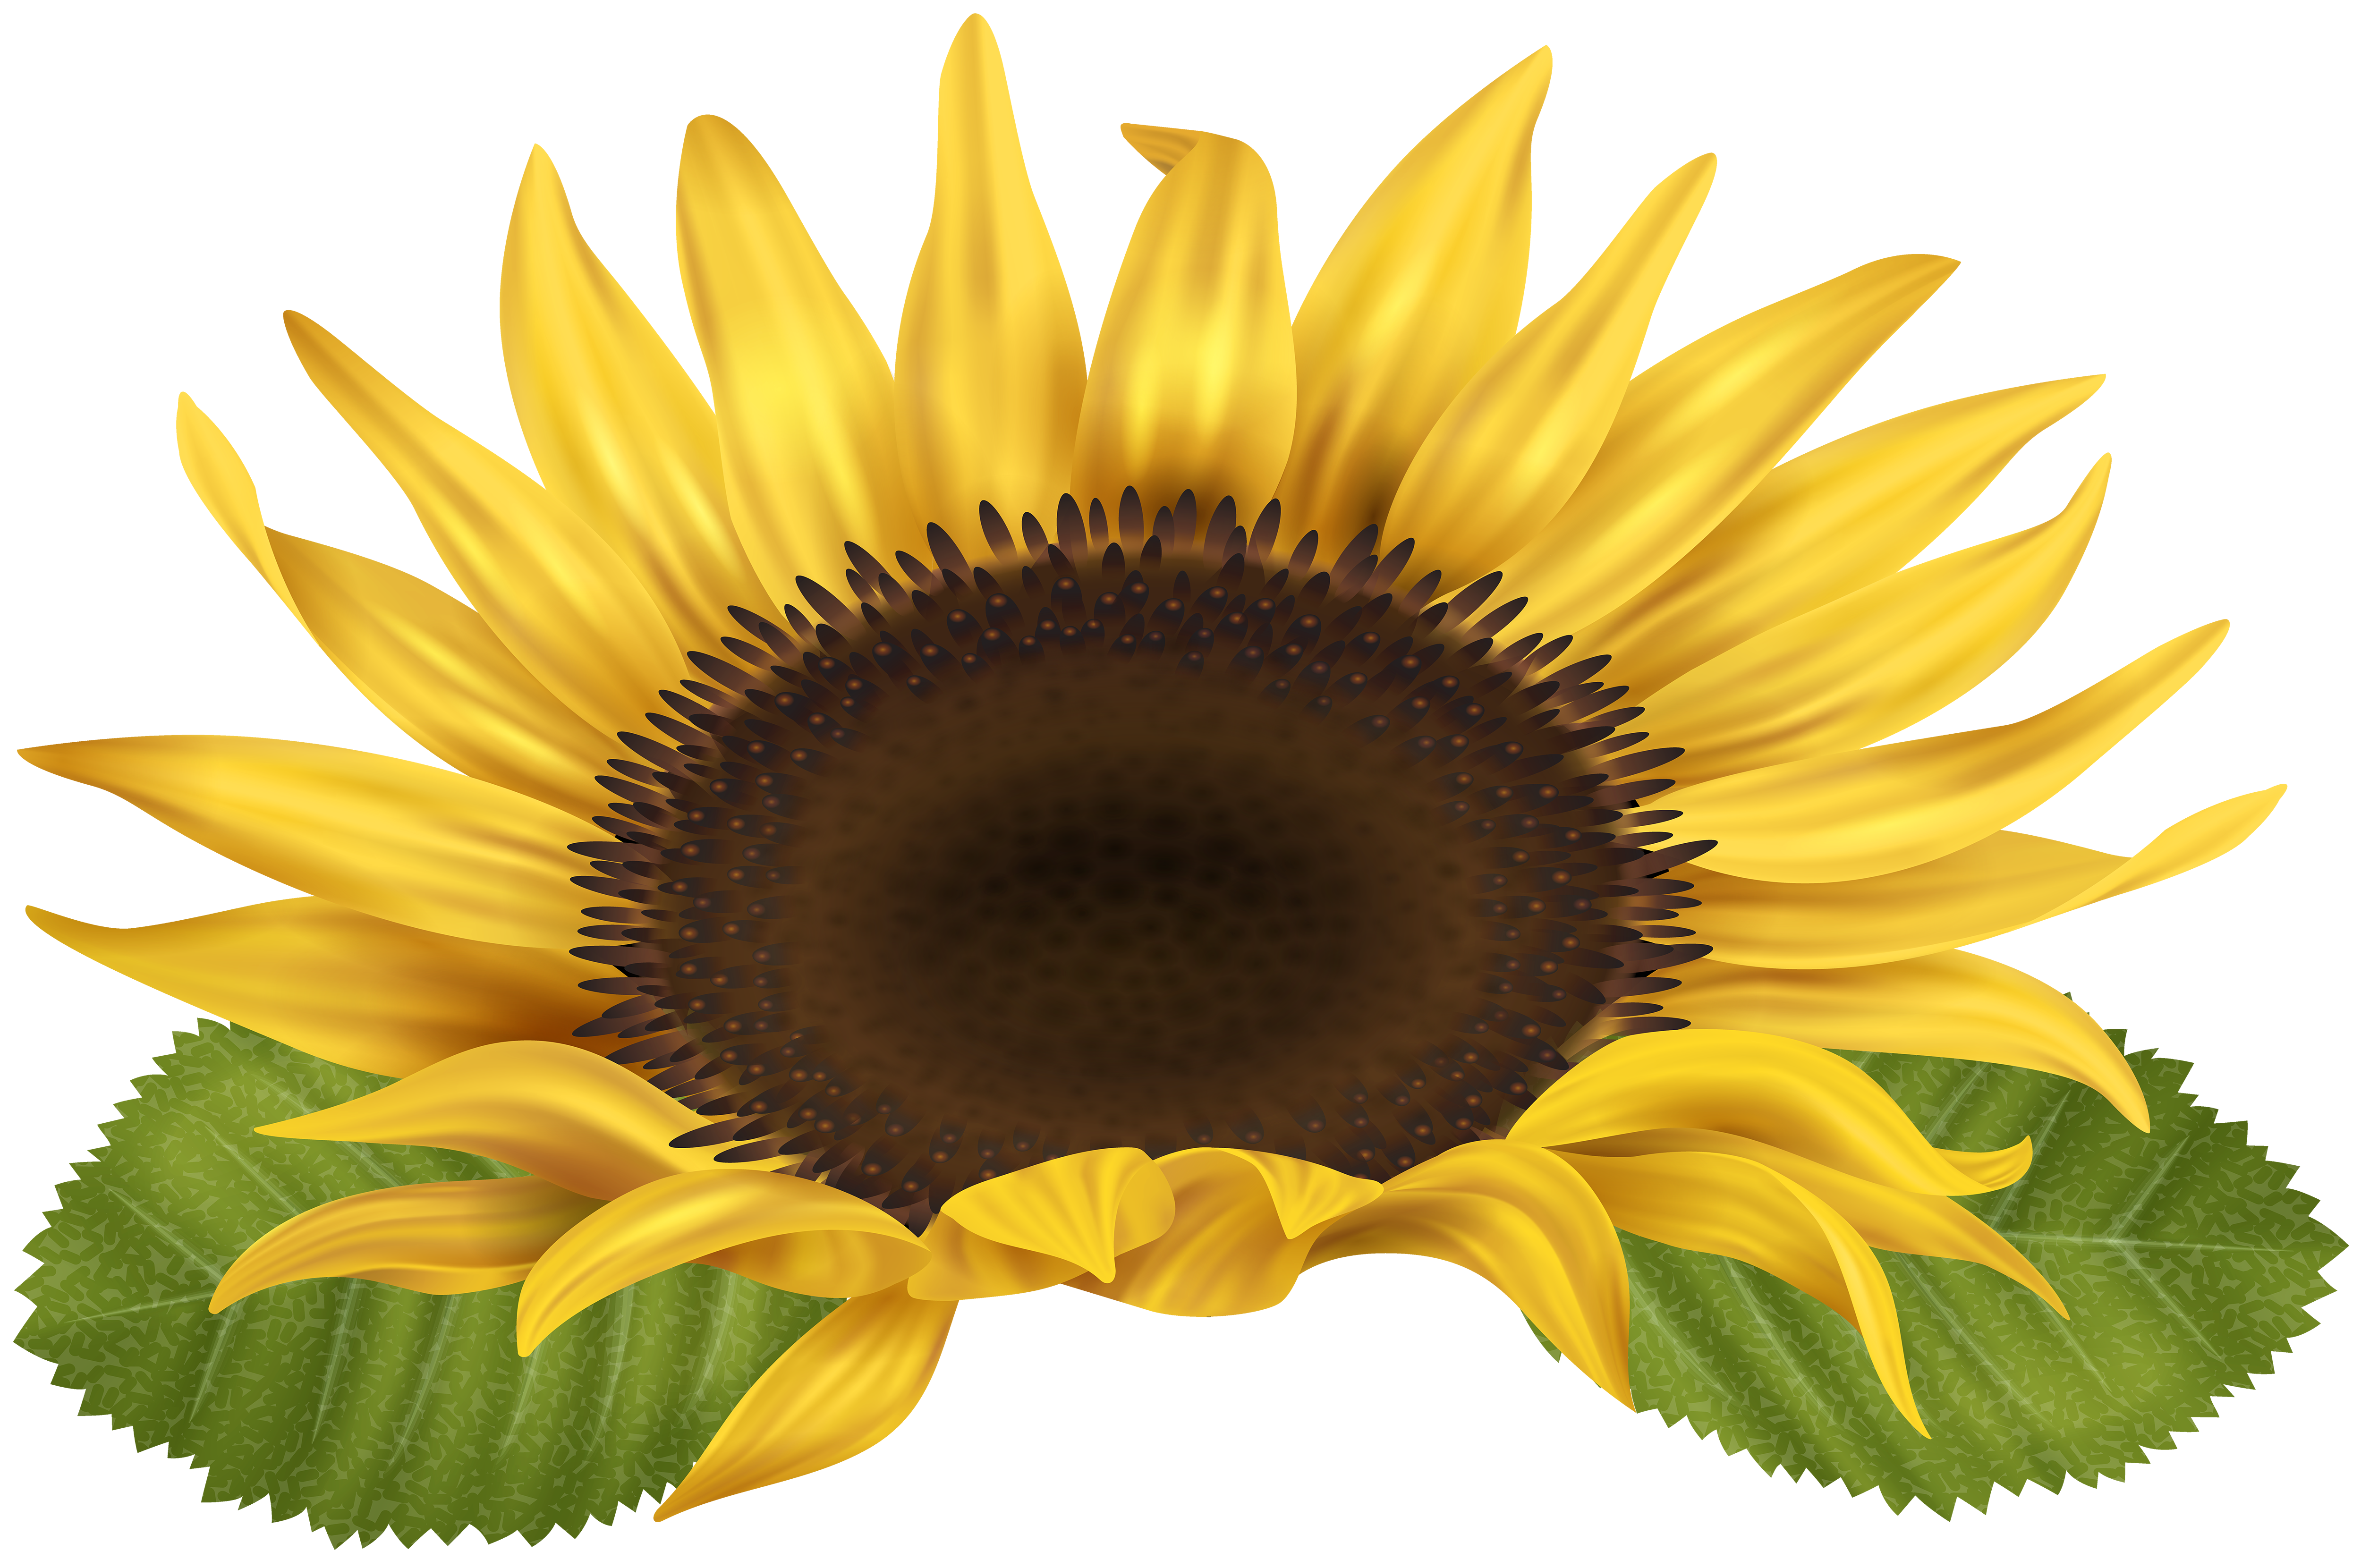 Sunflower clip art image. Sun flower png